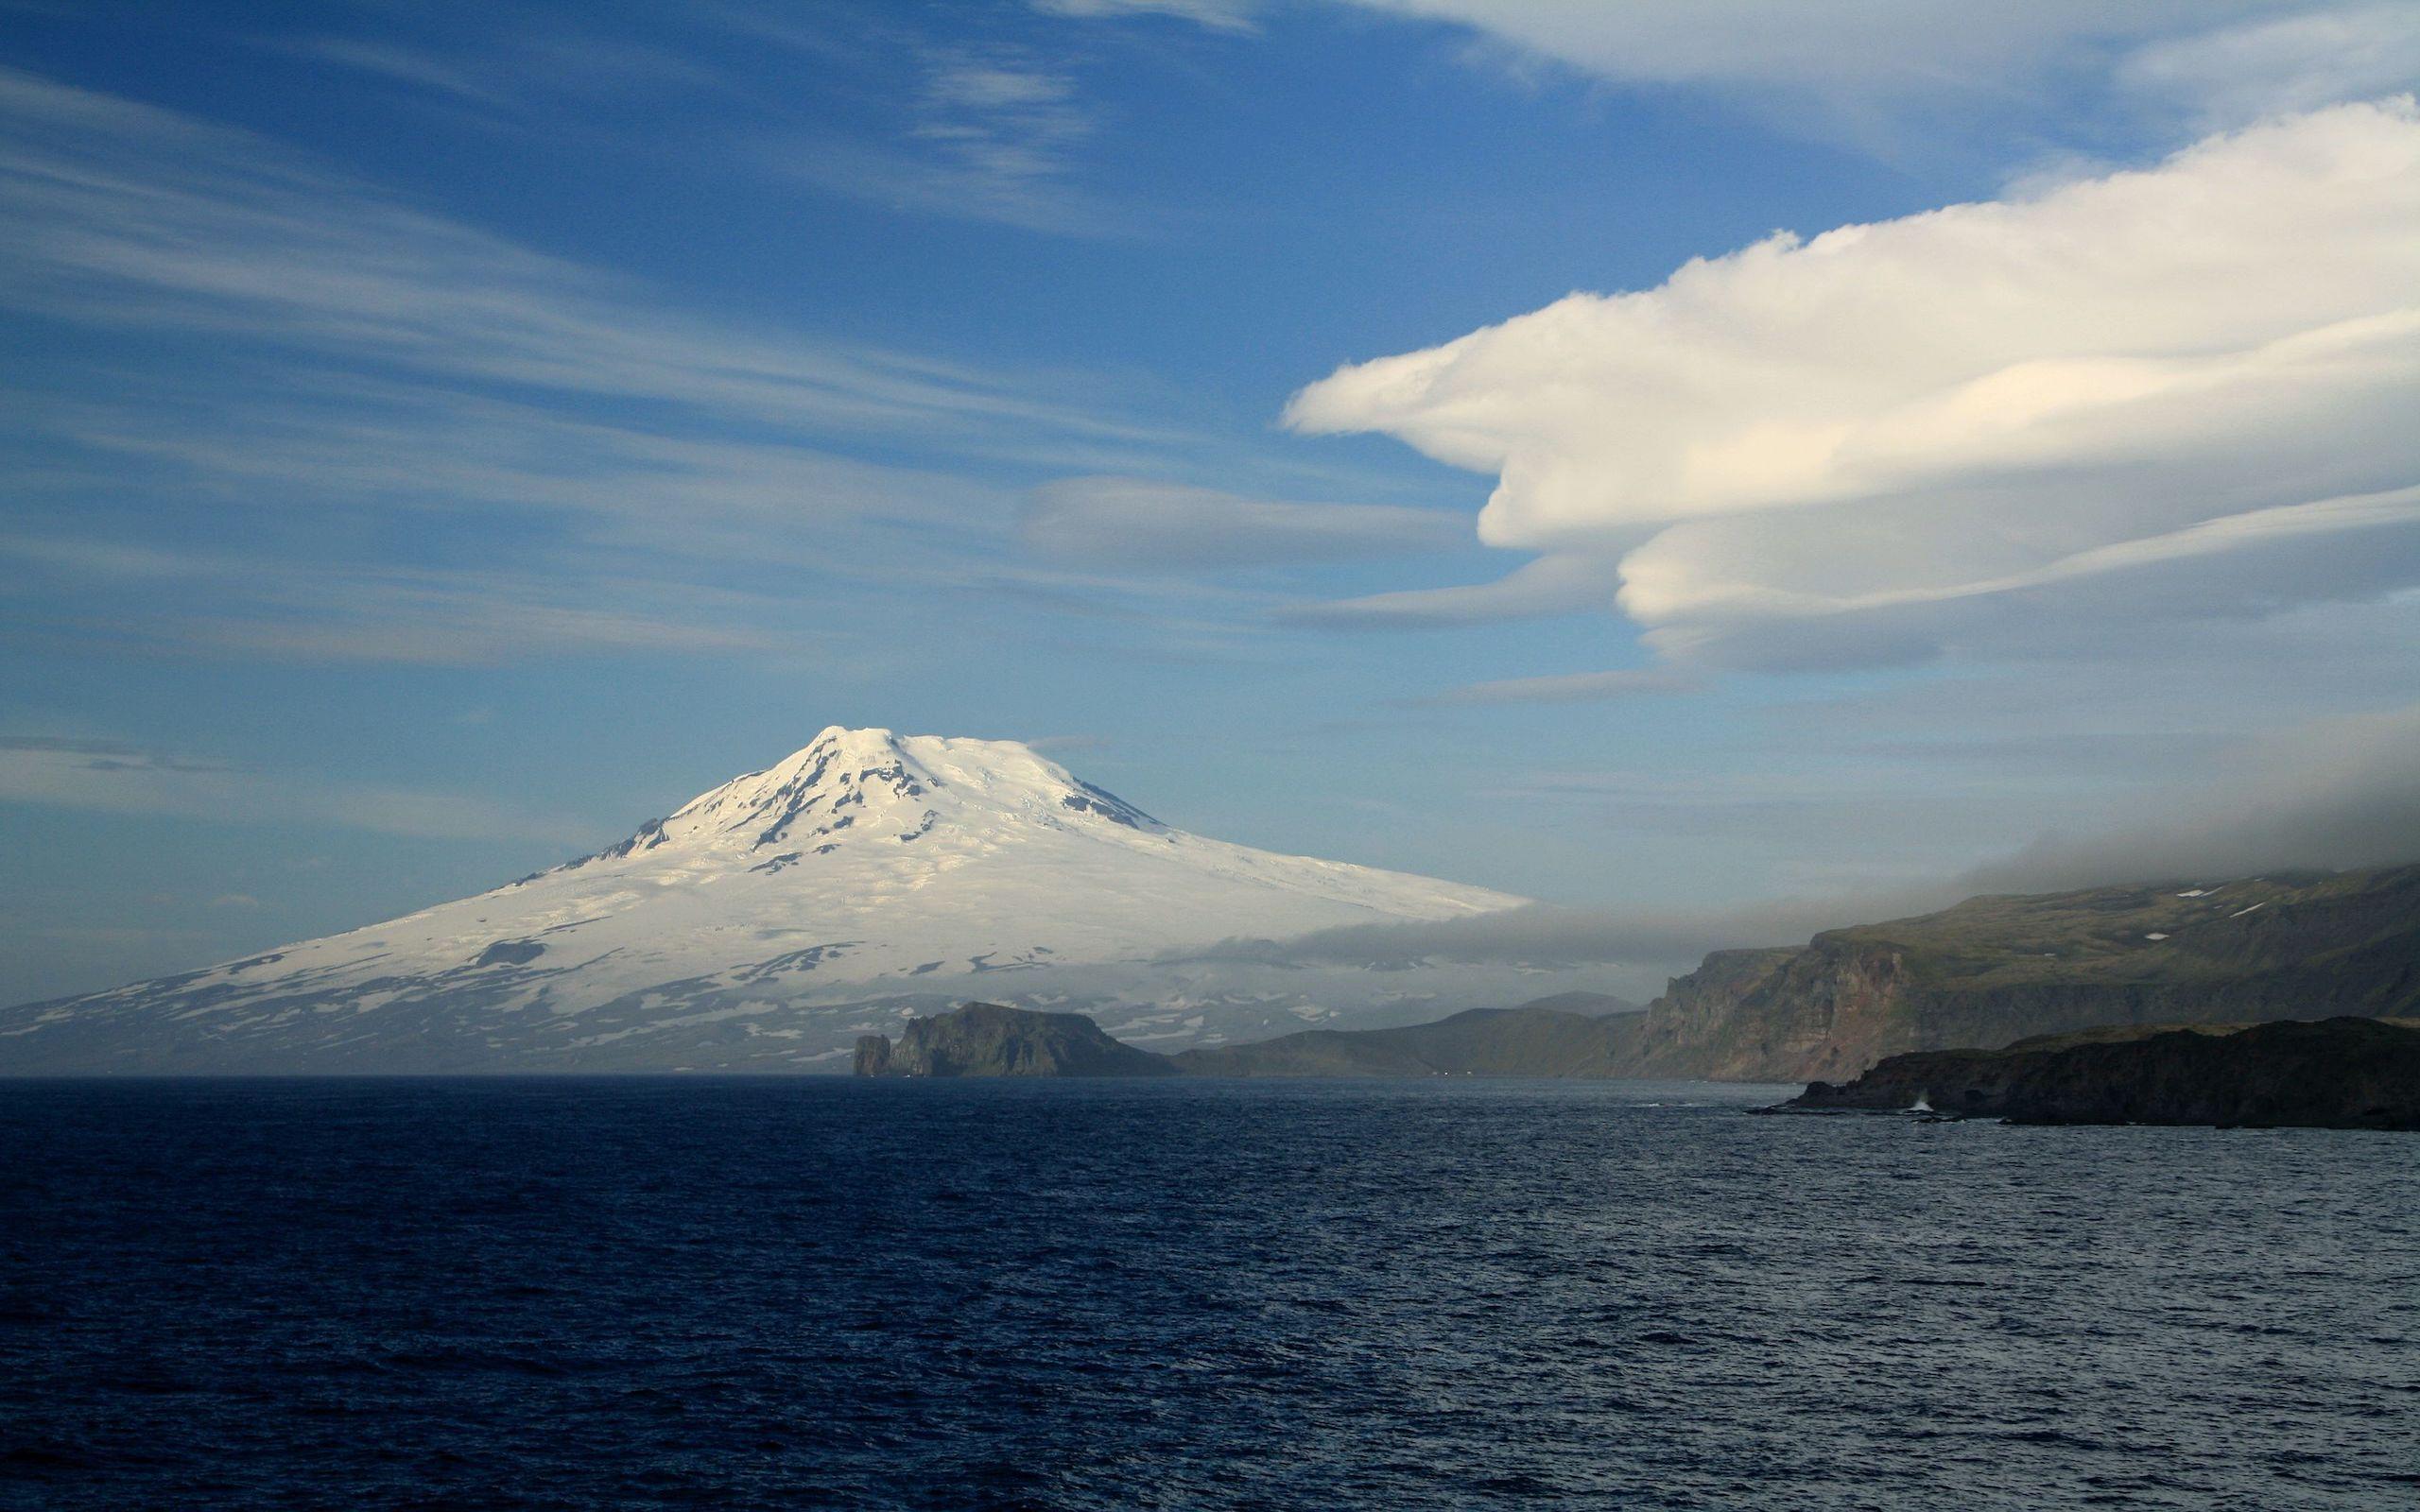 Inseln des Europäischen Nordmeeres (Bäreninsel, Jan Mayen, Shetlandinseln, Orkneyinseln, Färöer Inseln, Lofoten), norwegische Küste